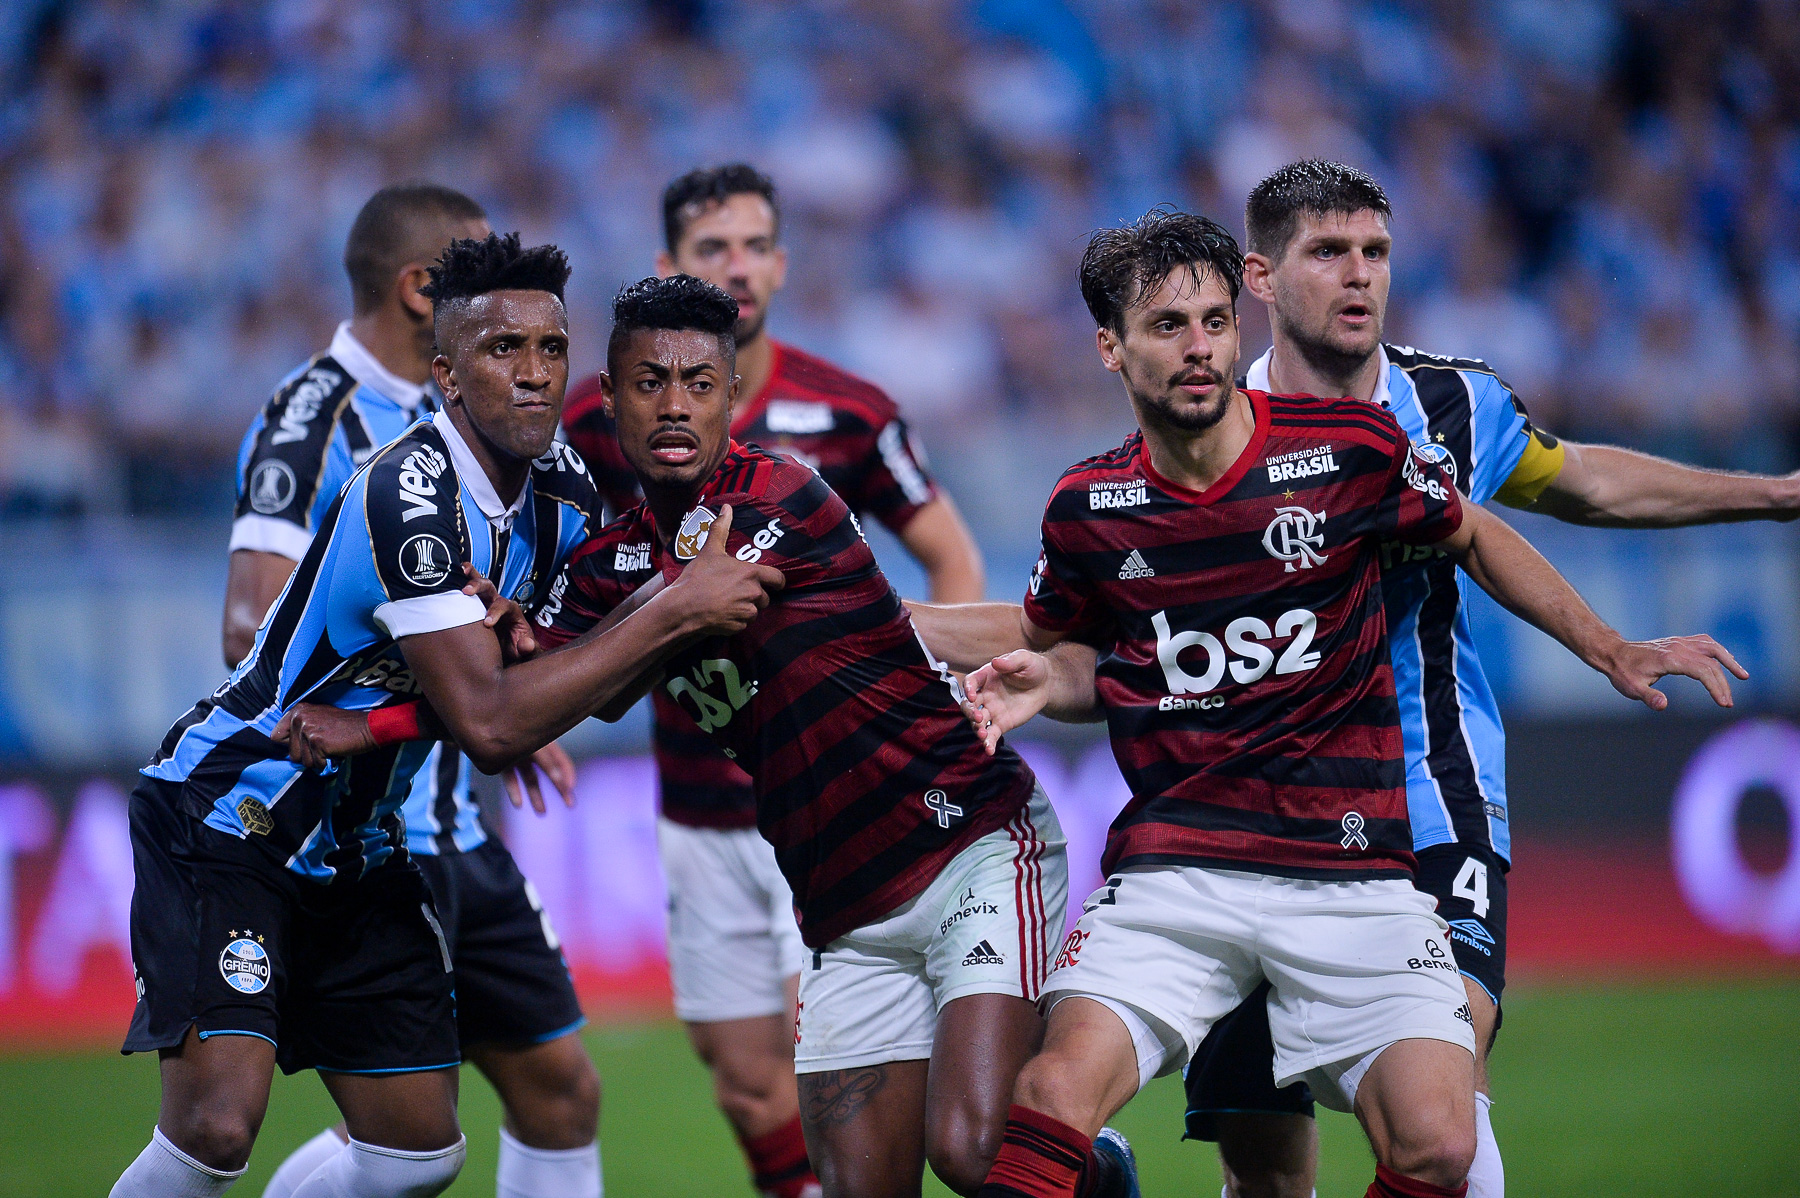 Gremio_X_Flamengo_dudabairros_Eleven_186